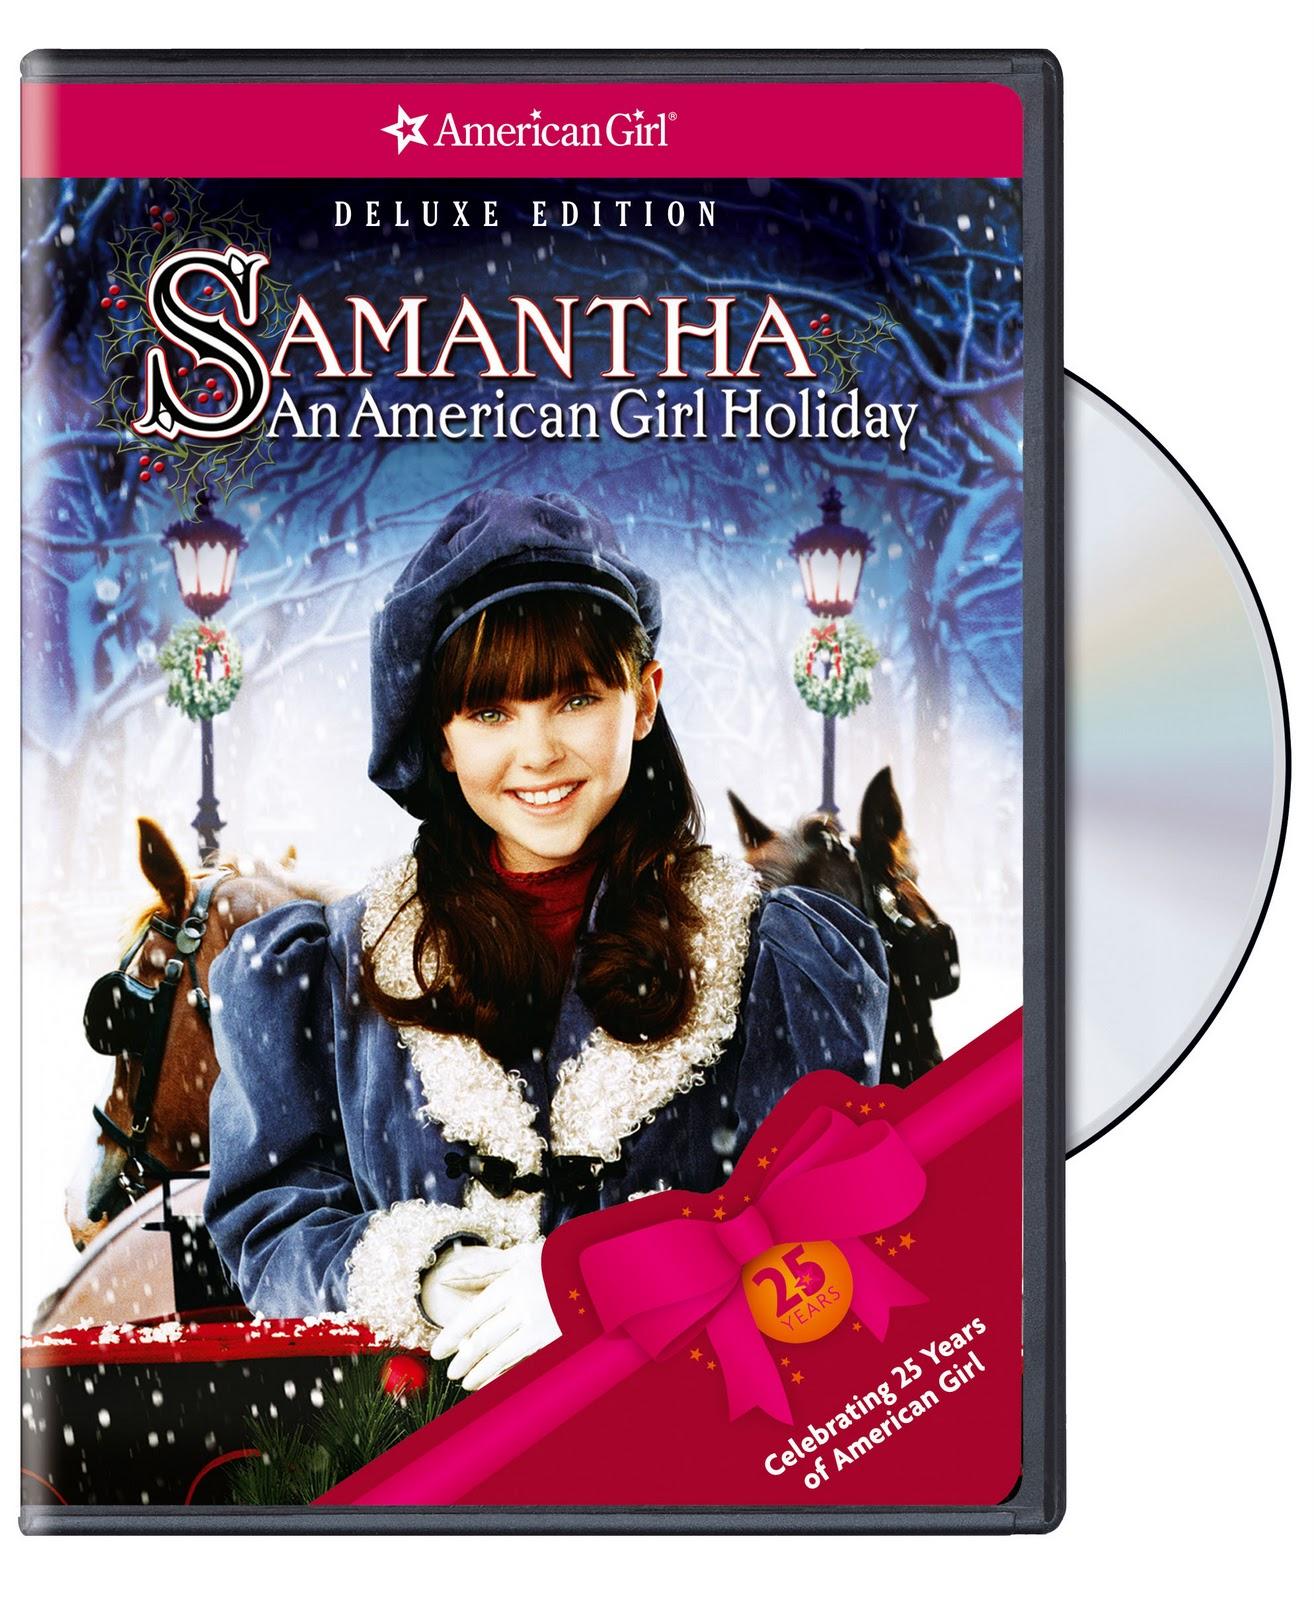 making ends meet samantha an american girl holiday movie